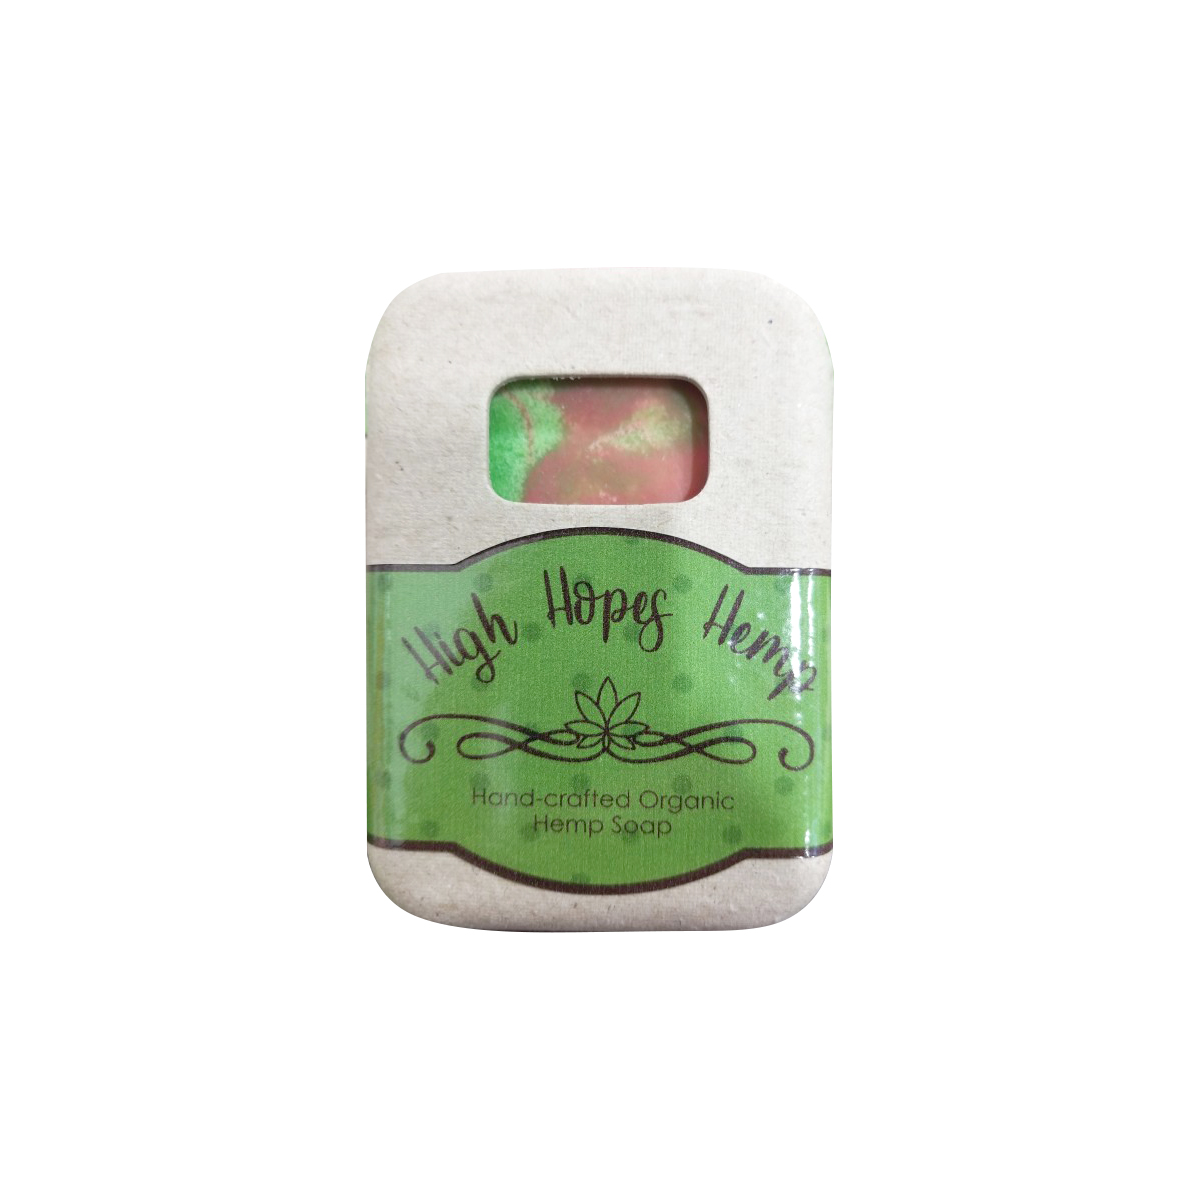 IAG-Handcrafted-Organic-Hemp-Soap-Front-1-1200×1200